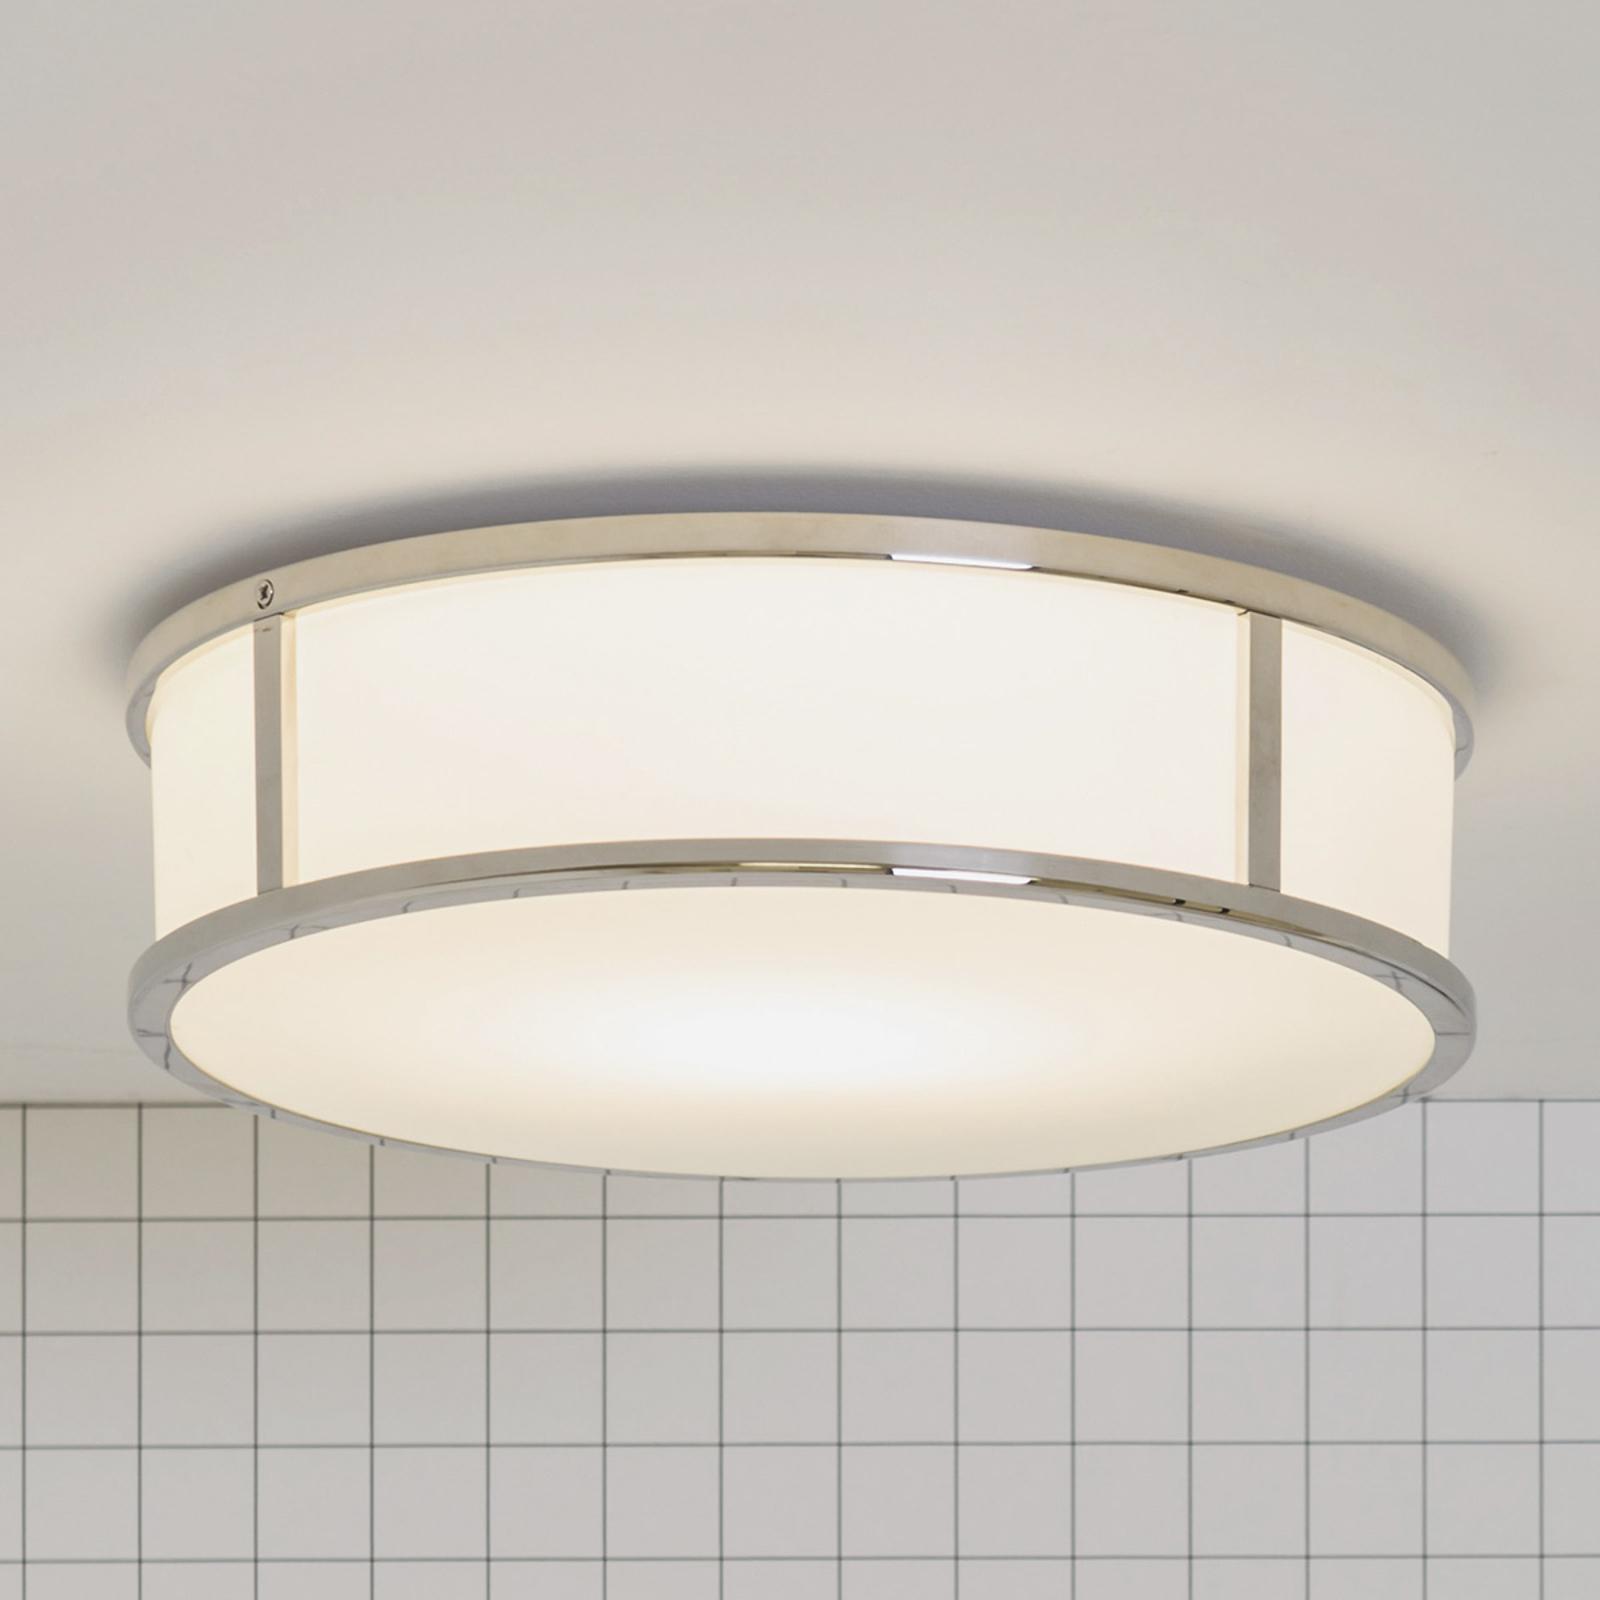 Astro Mashiko Round plafondlamp Ø 30 cm chroom